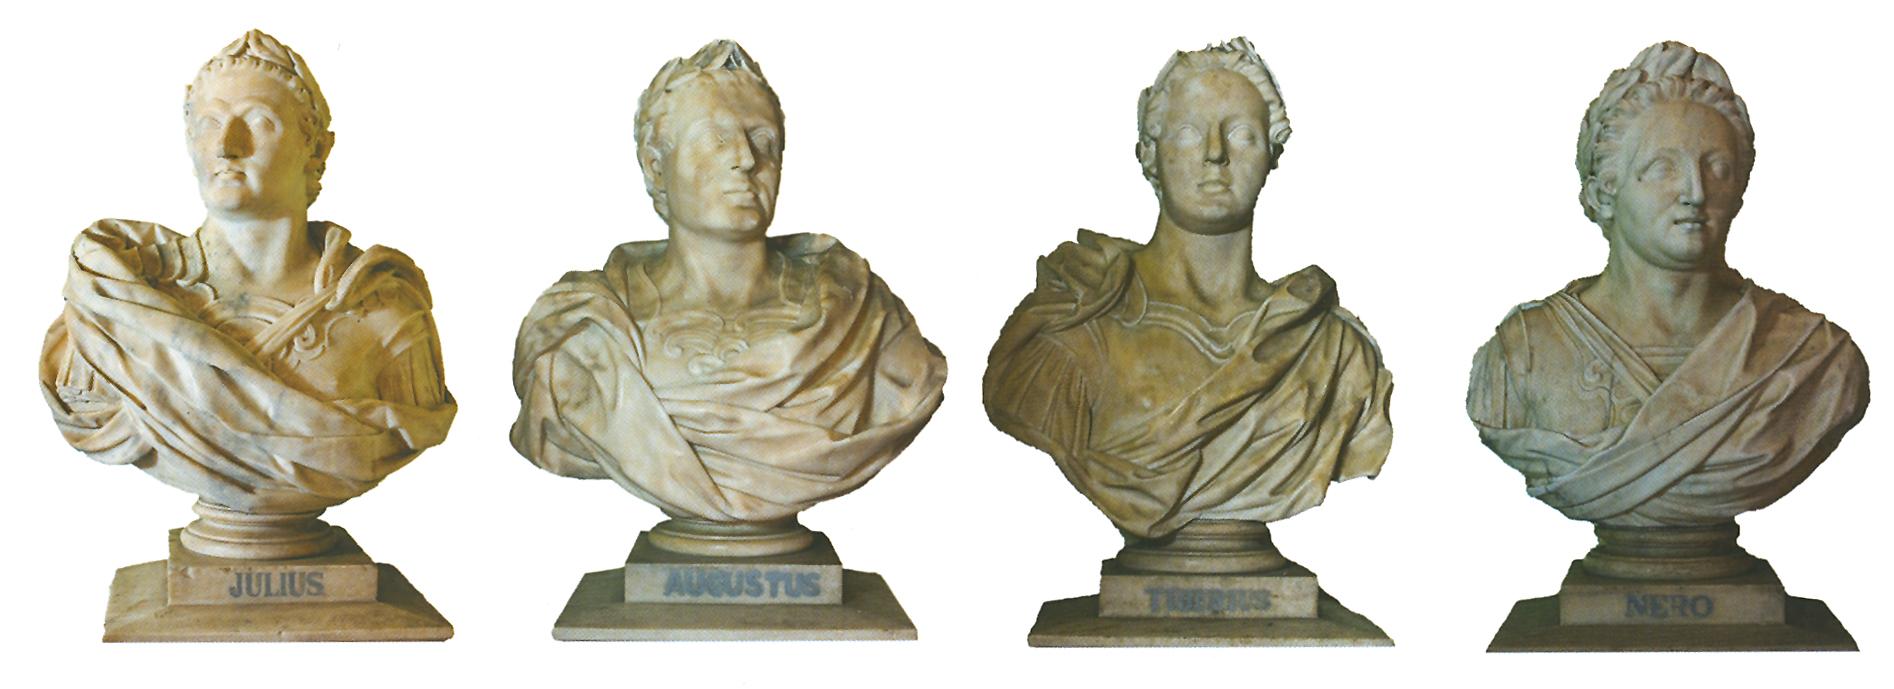 Busts of theTwelve Caesars at the Raj Bhavan, Calcutta.